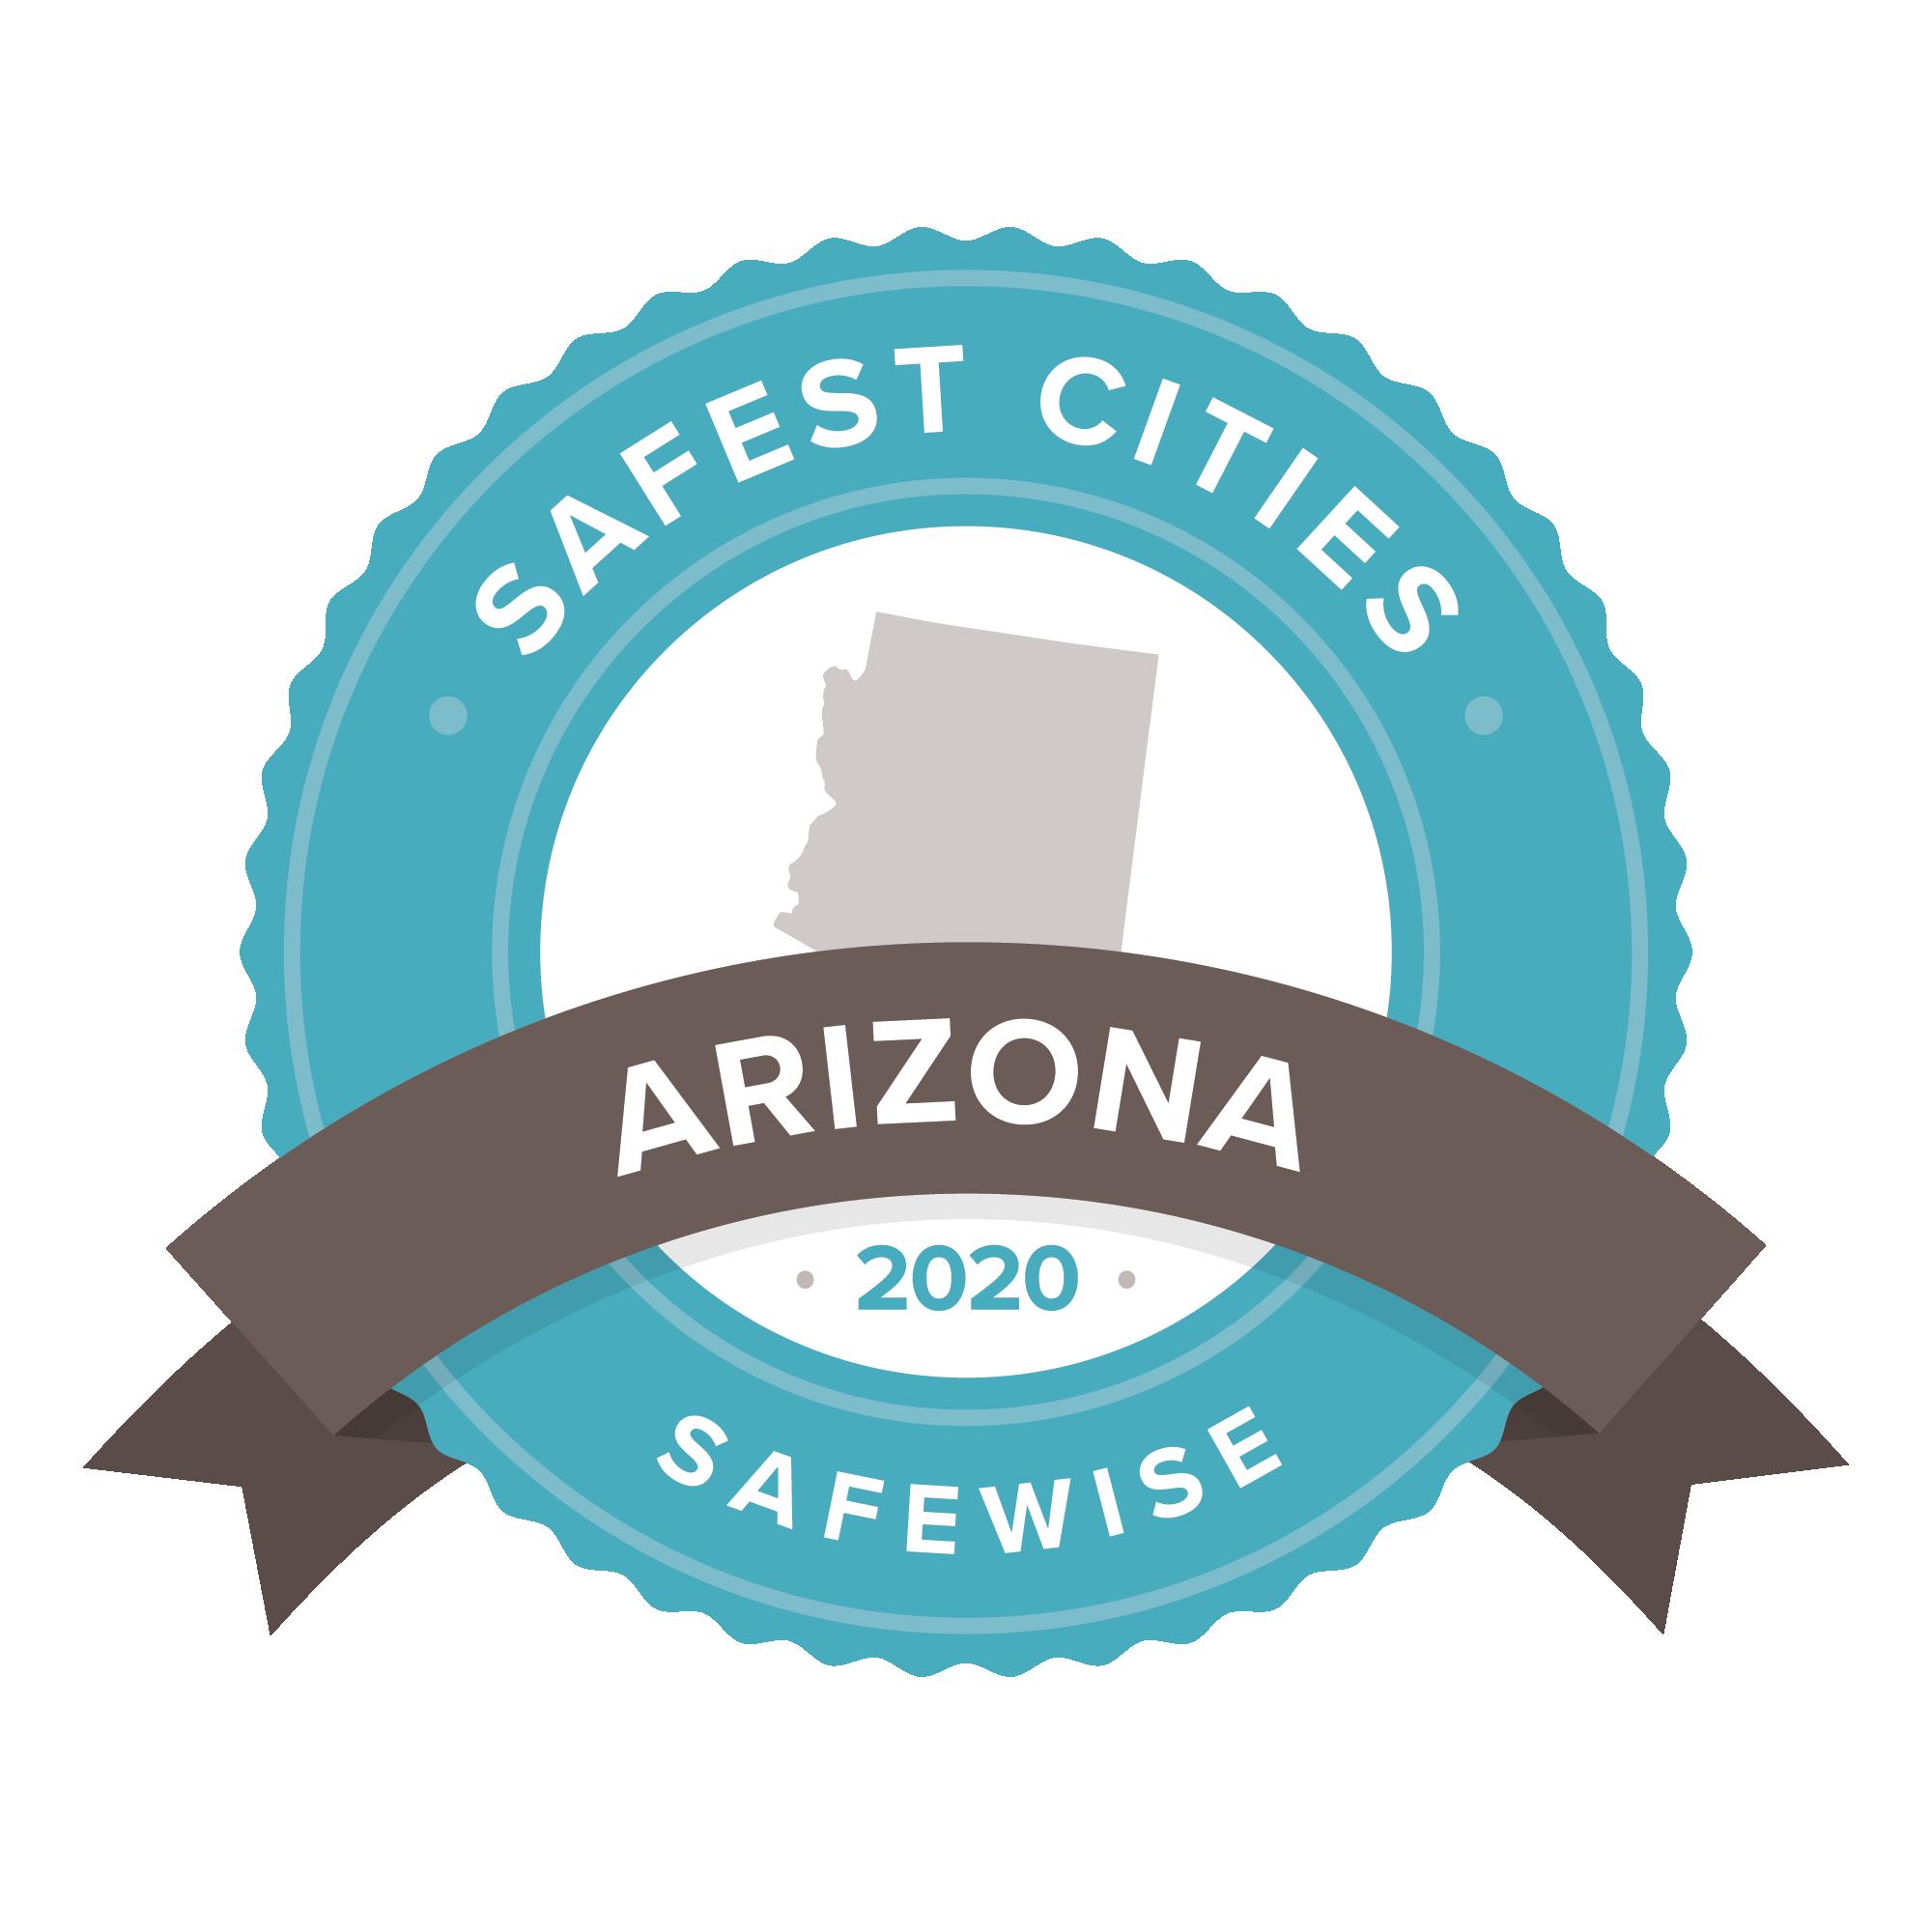 Arizona Safest cities badge